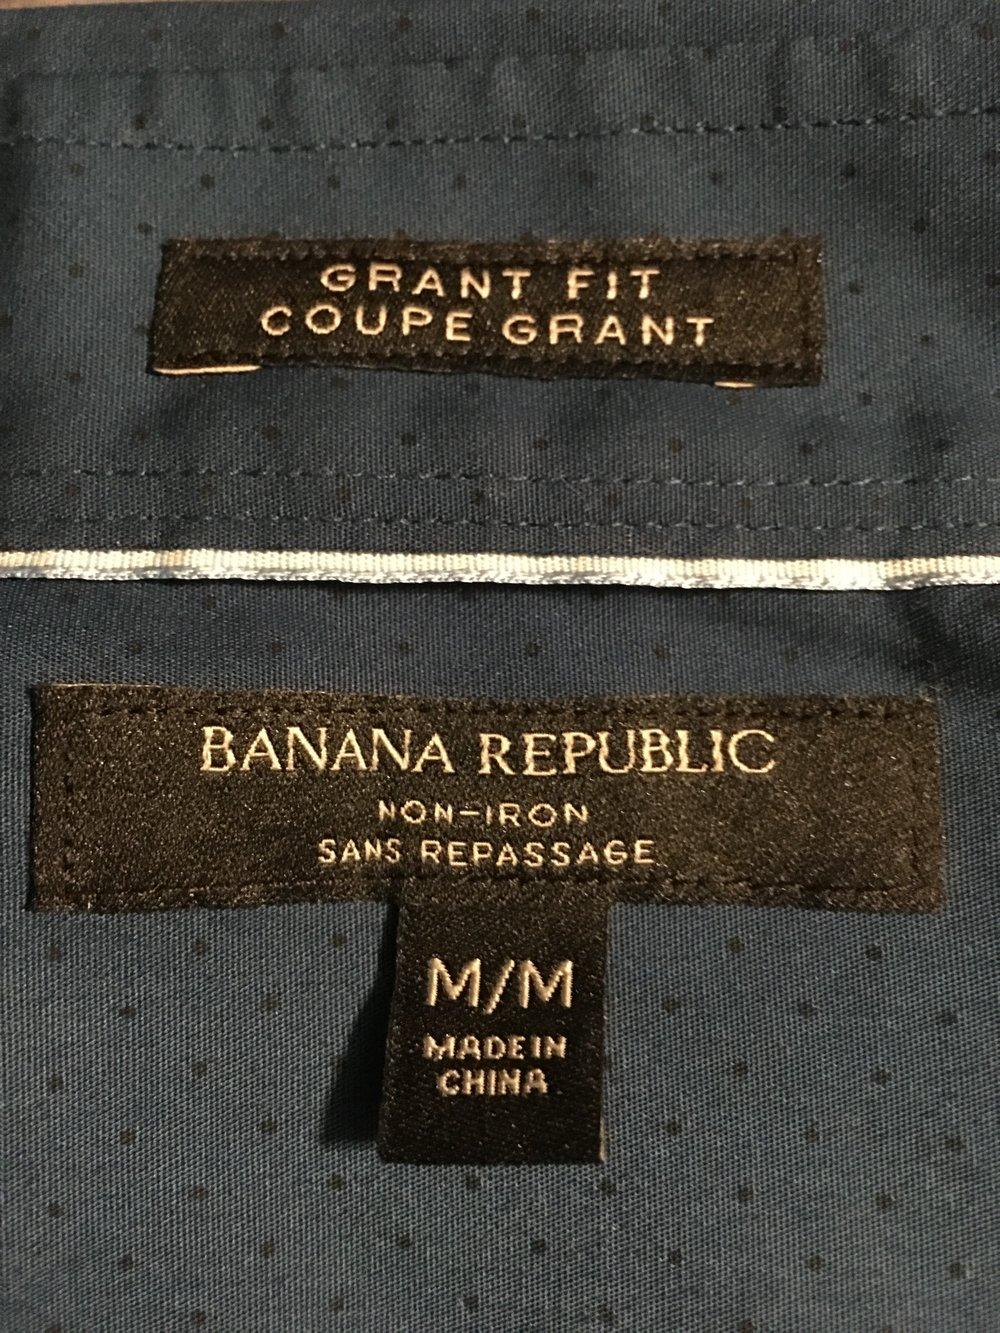 Banana Republic retail tag (no diamonds on label)